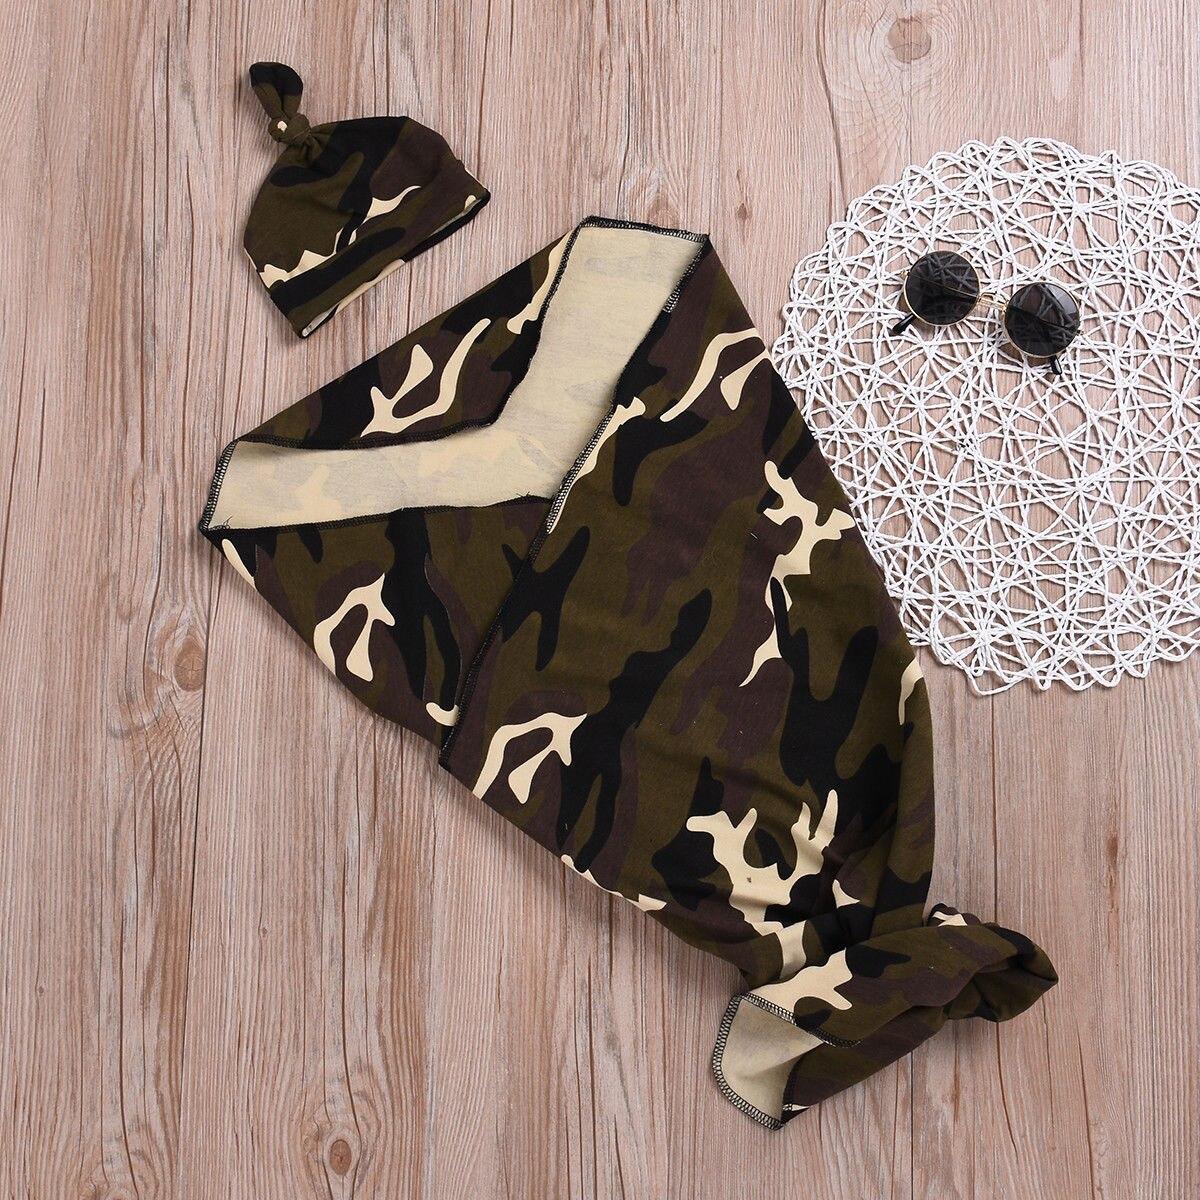 Newborn Baby Girl Boy Camo Swaddle Wrap Cotton Blanket Sleeping Bag+Hat Outfits